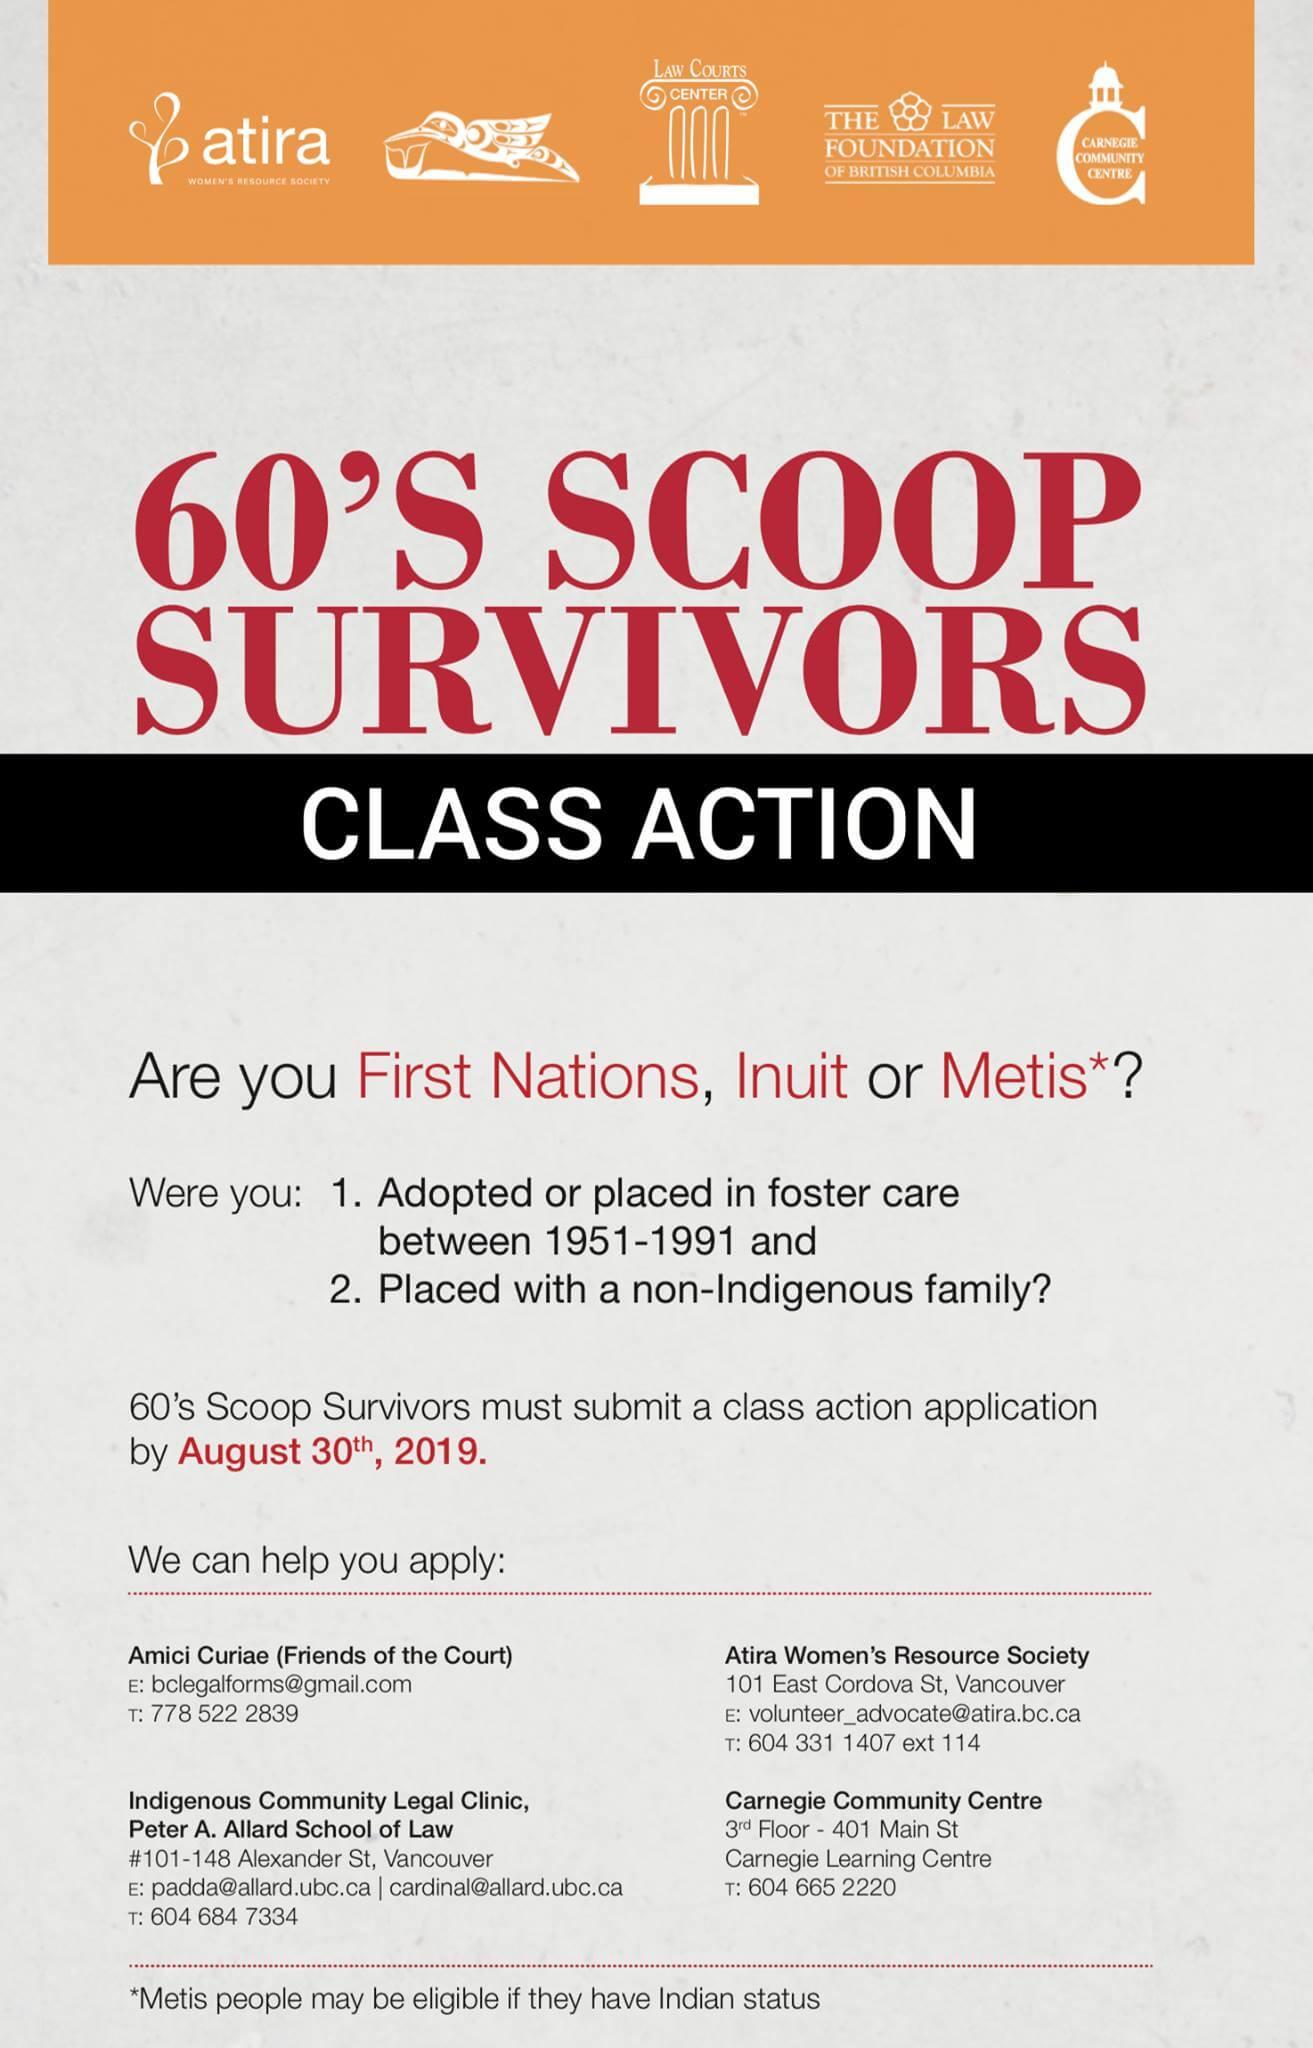 60's Scoop Survivors Class Action